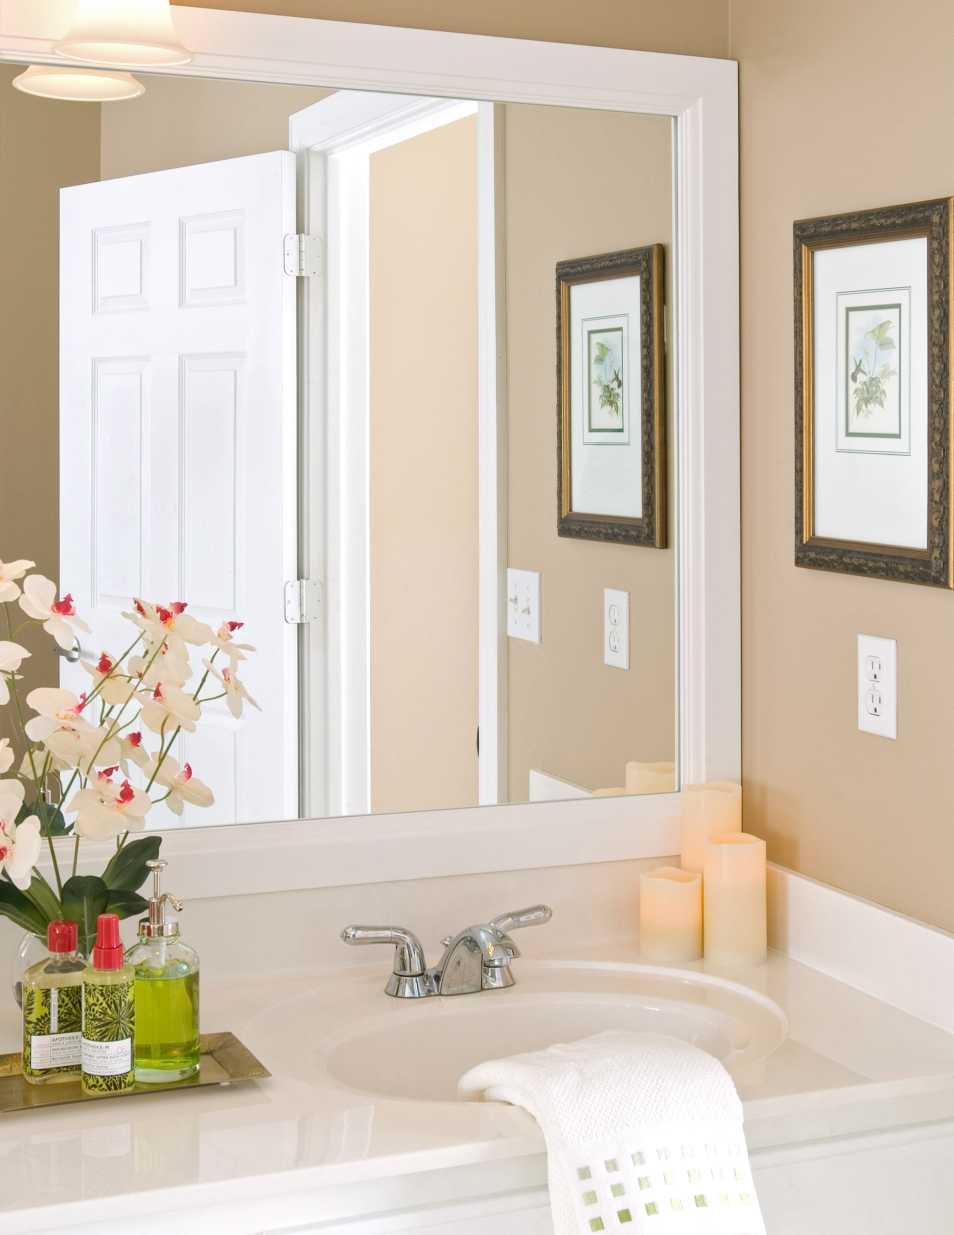 Durham Bathroom Mirror Frame |3 Inch Wide